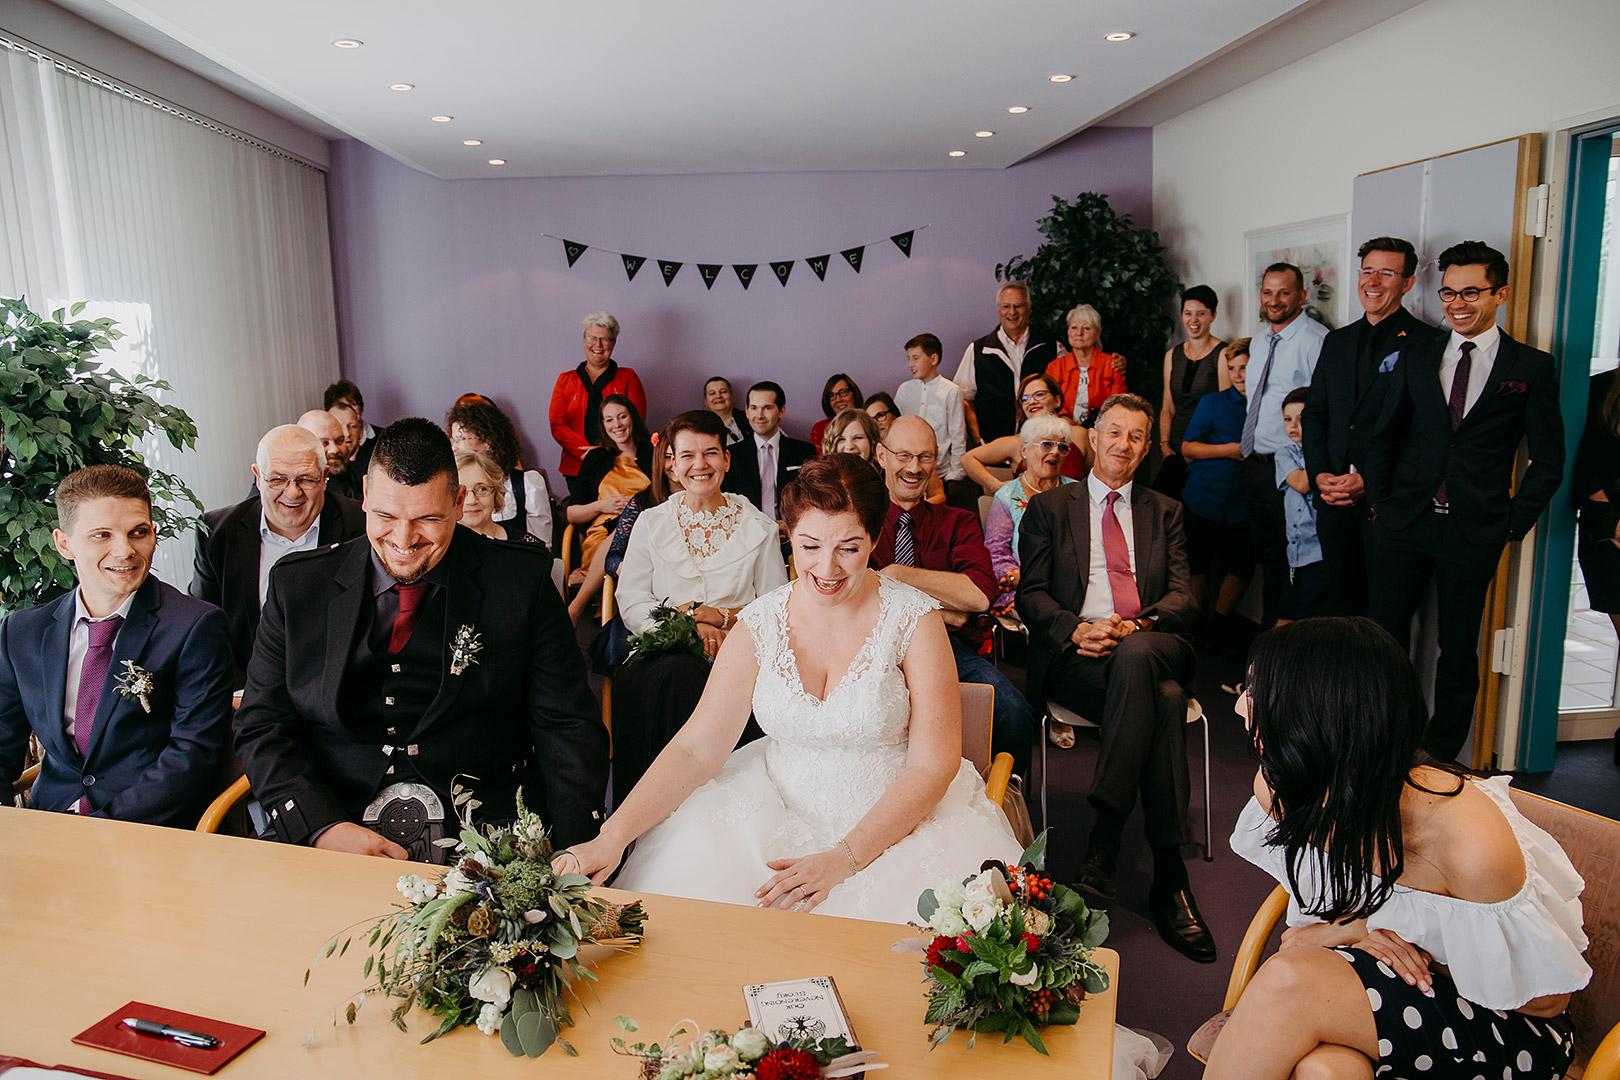 portrait_wedding_sabrinaundenrico_55